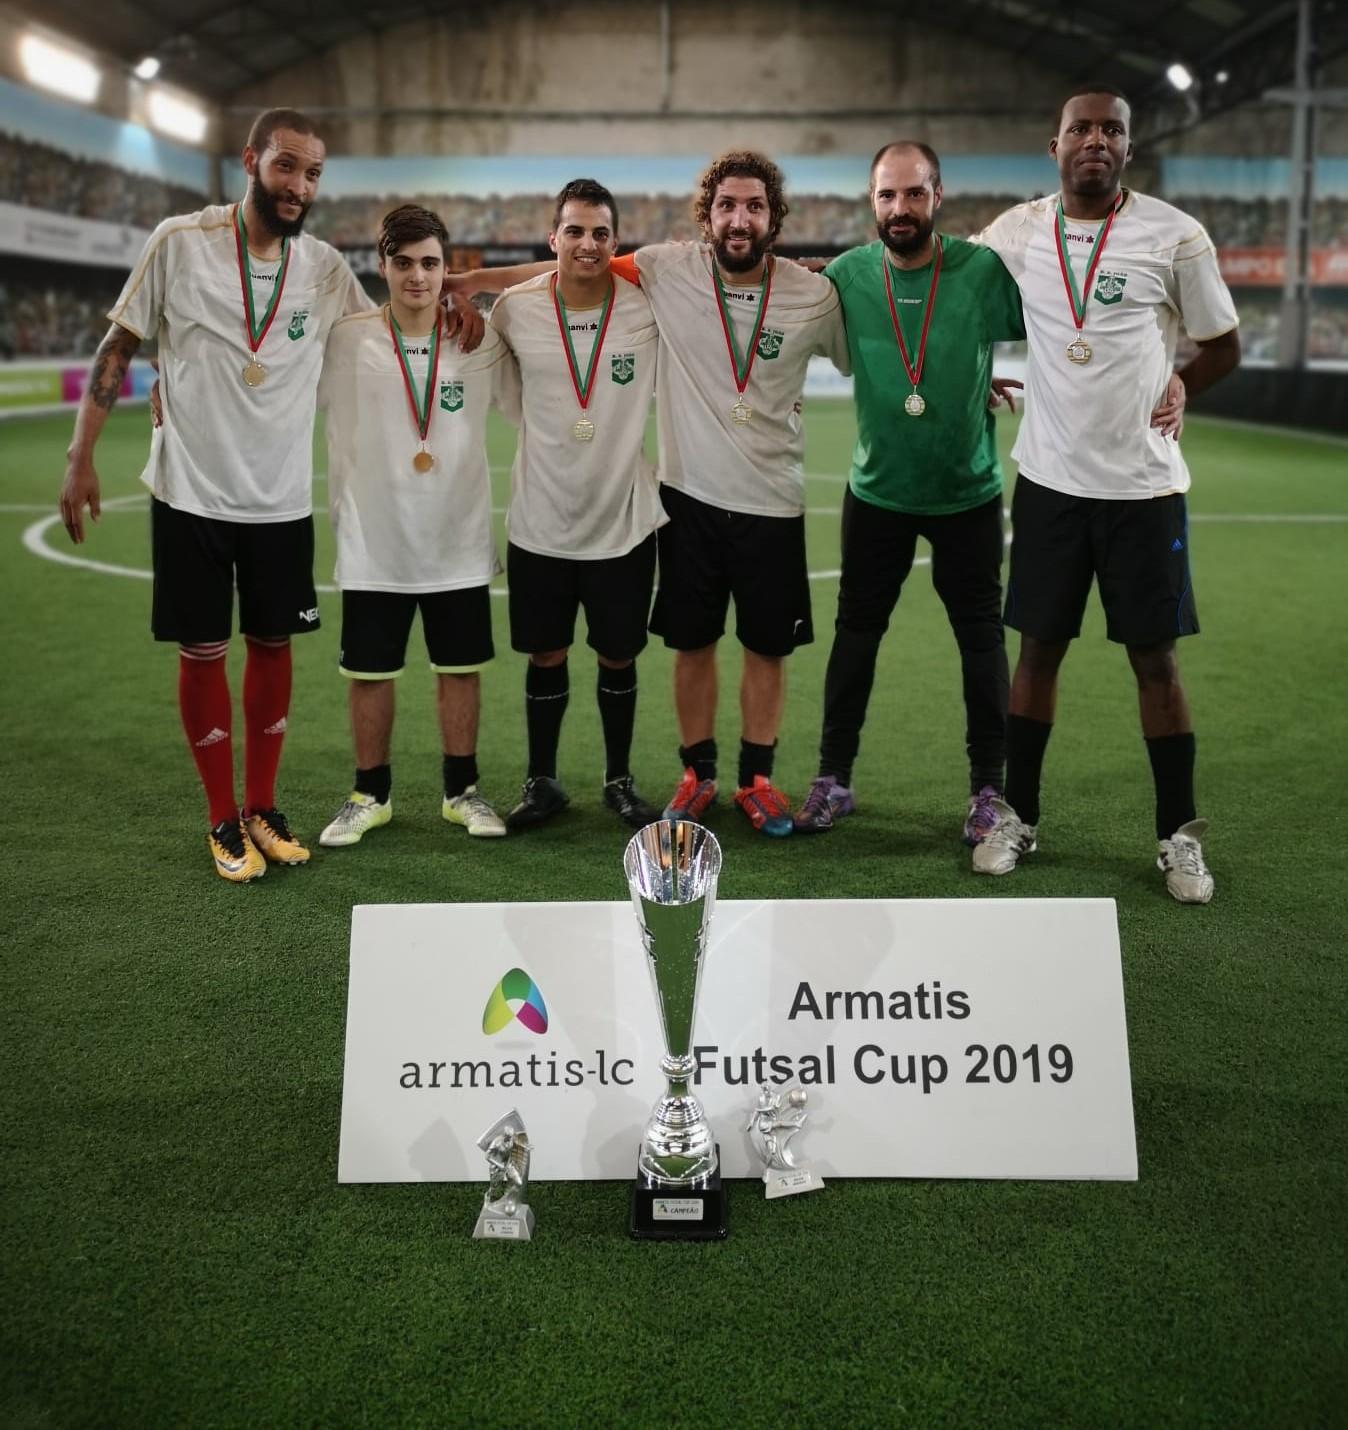 Armatis Futsal Cup 2019